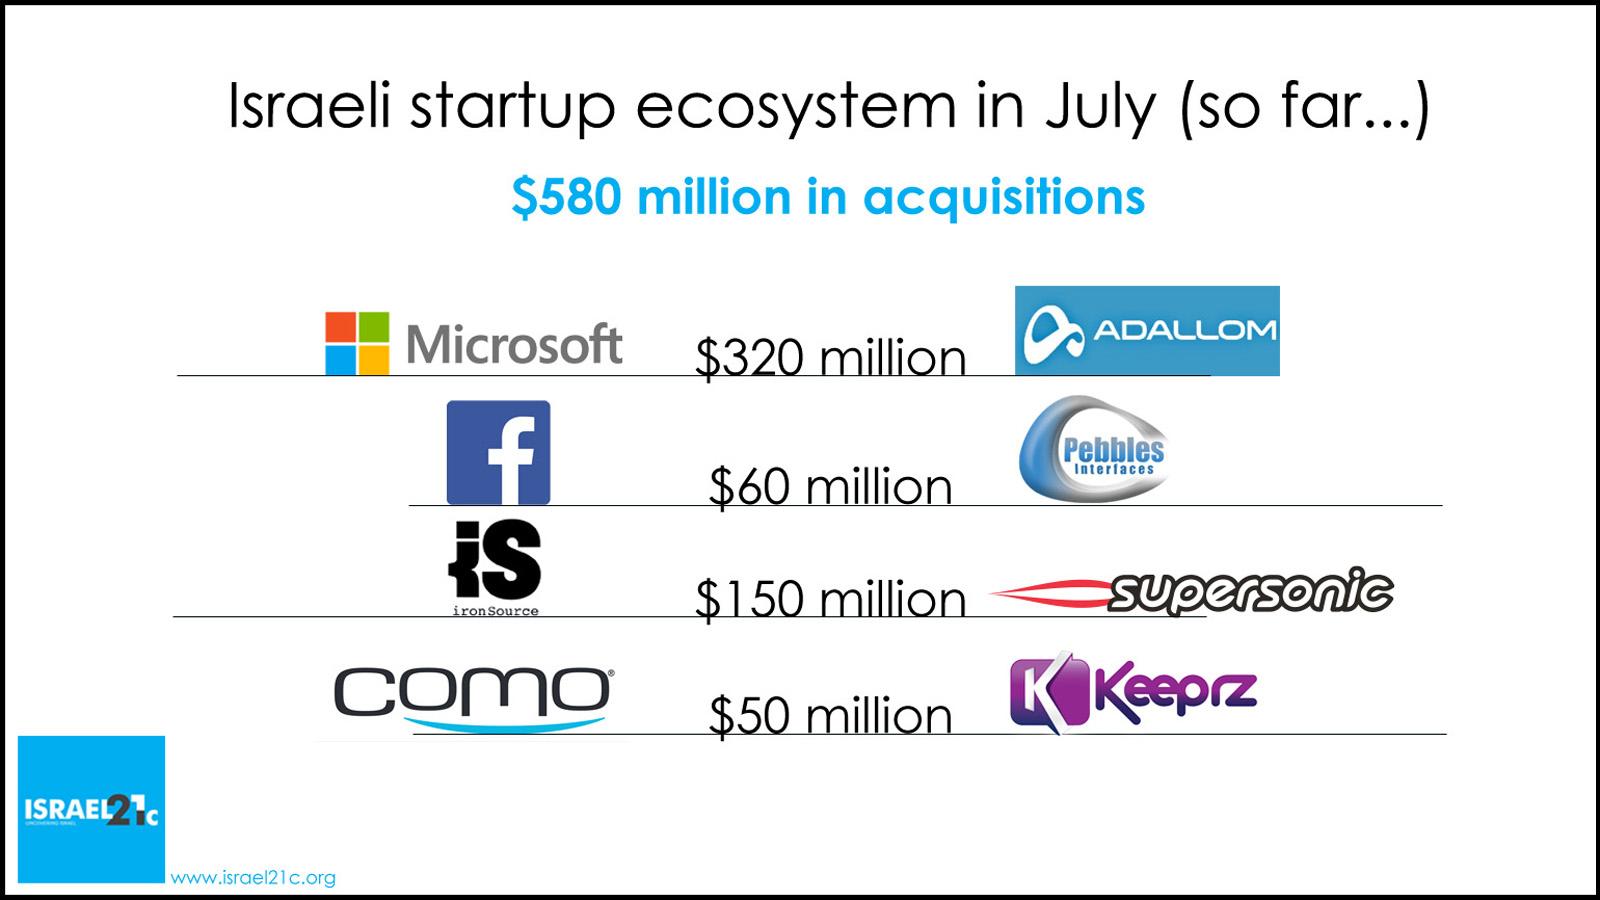 Summer sales in the Israeli startup arena. (ISRAEL21c.org)